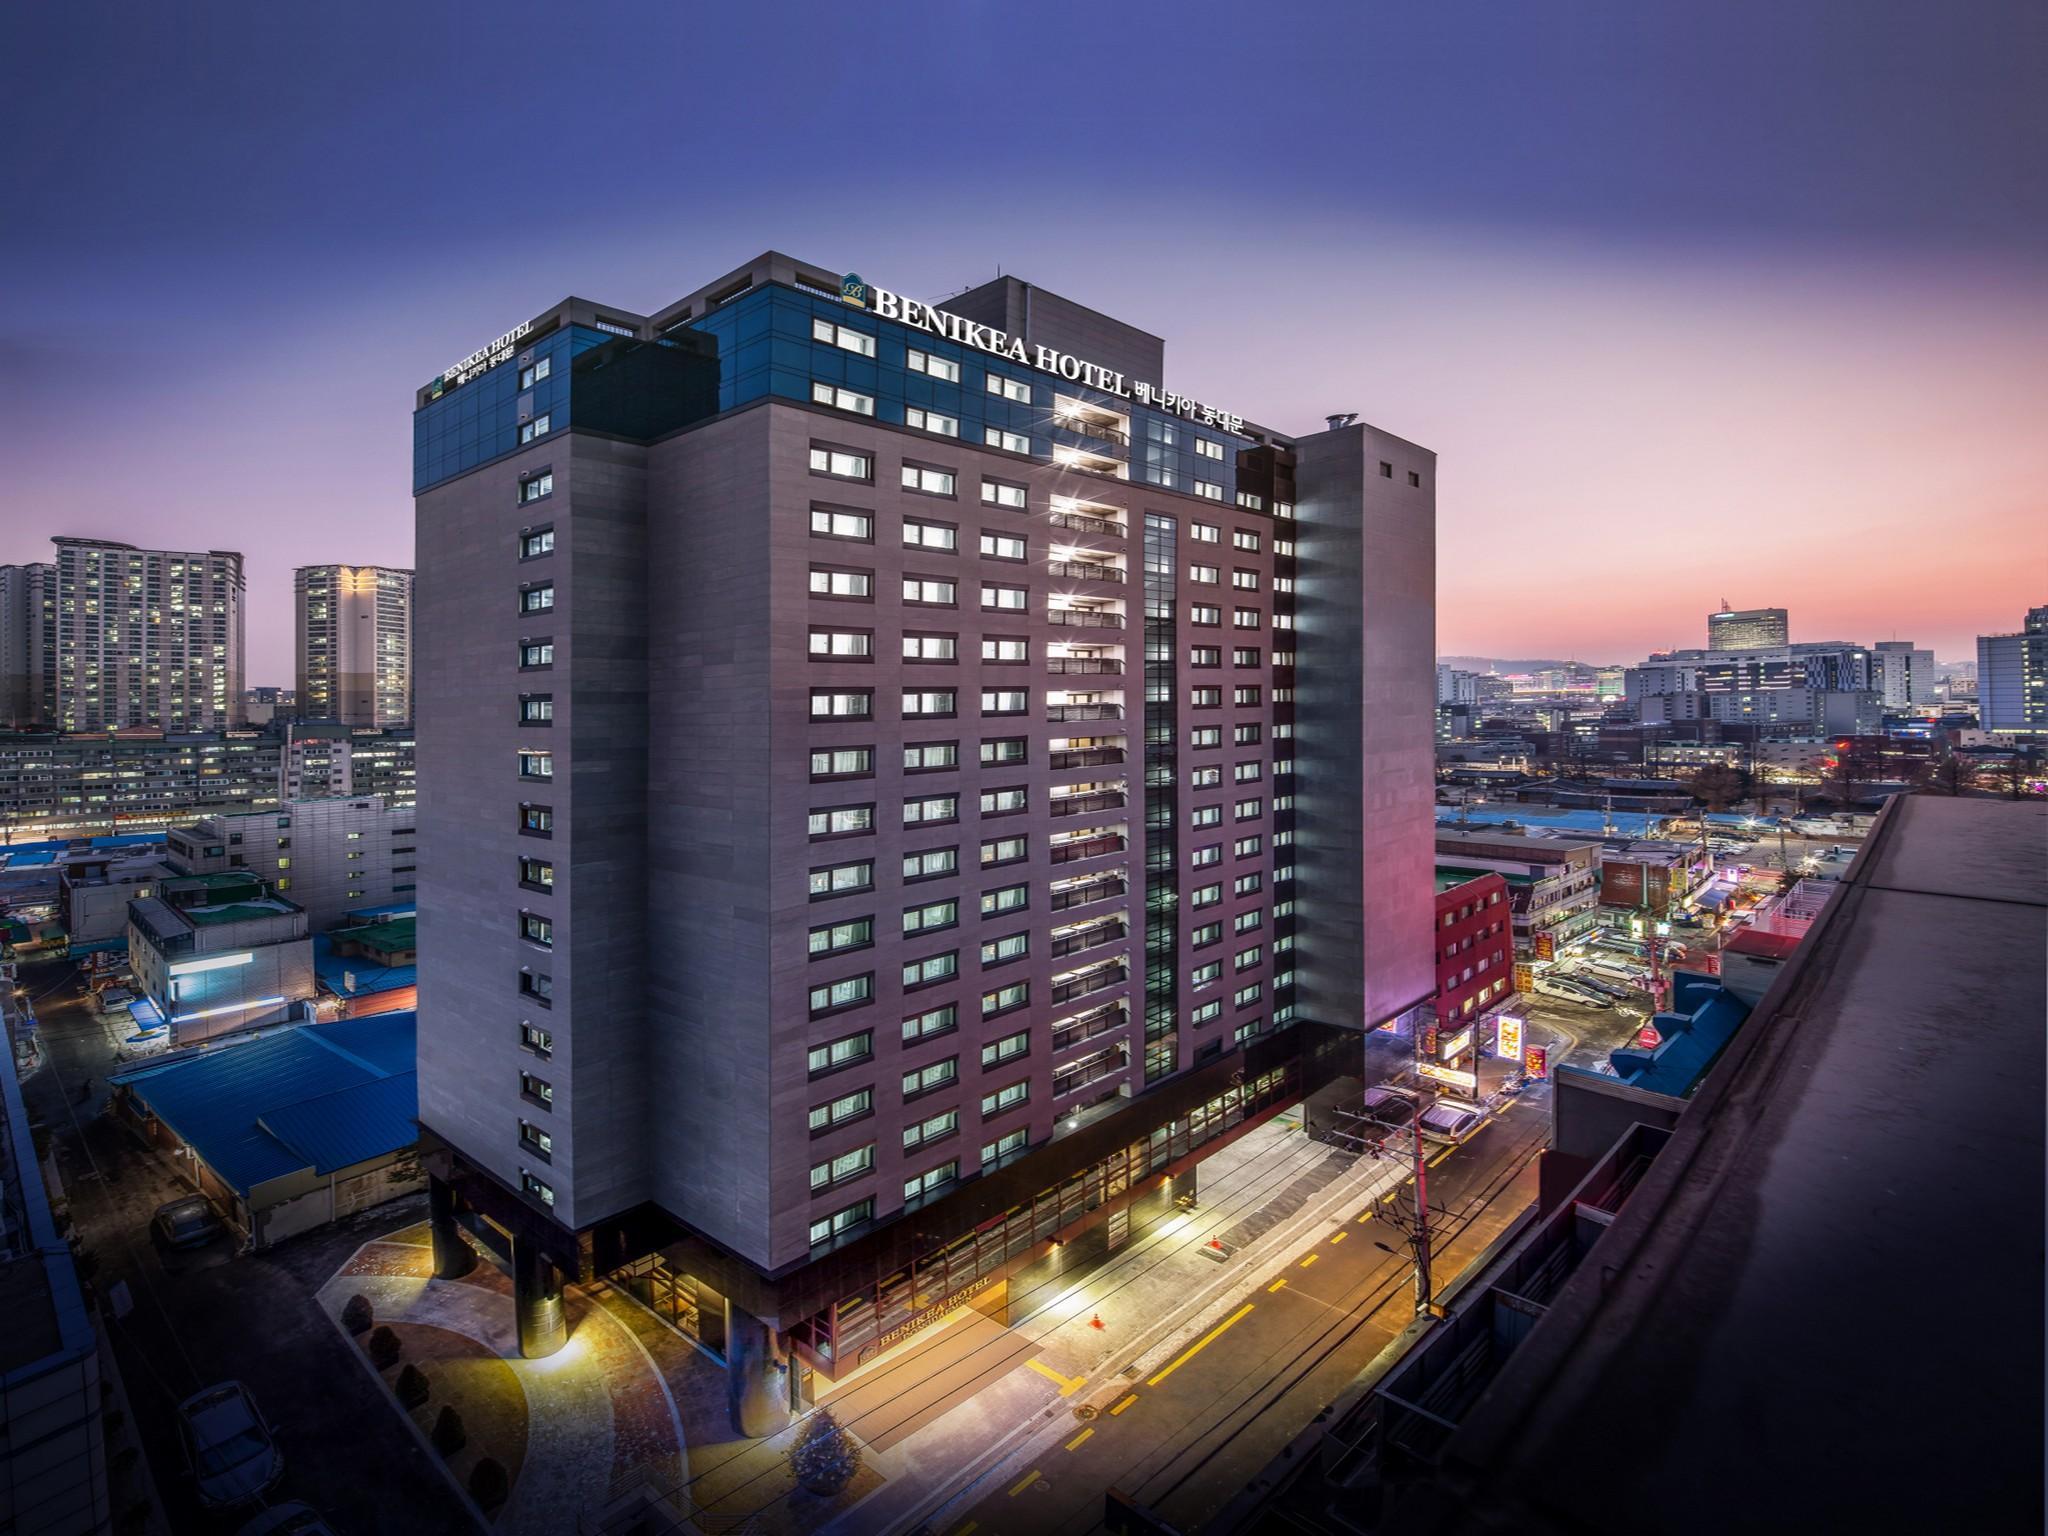 Benikea Premier Hotel Dongdaemun